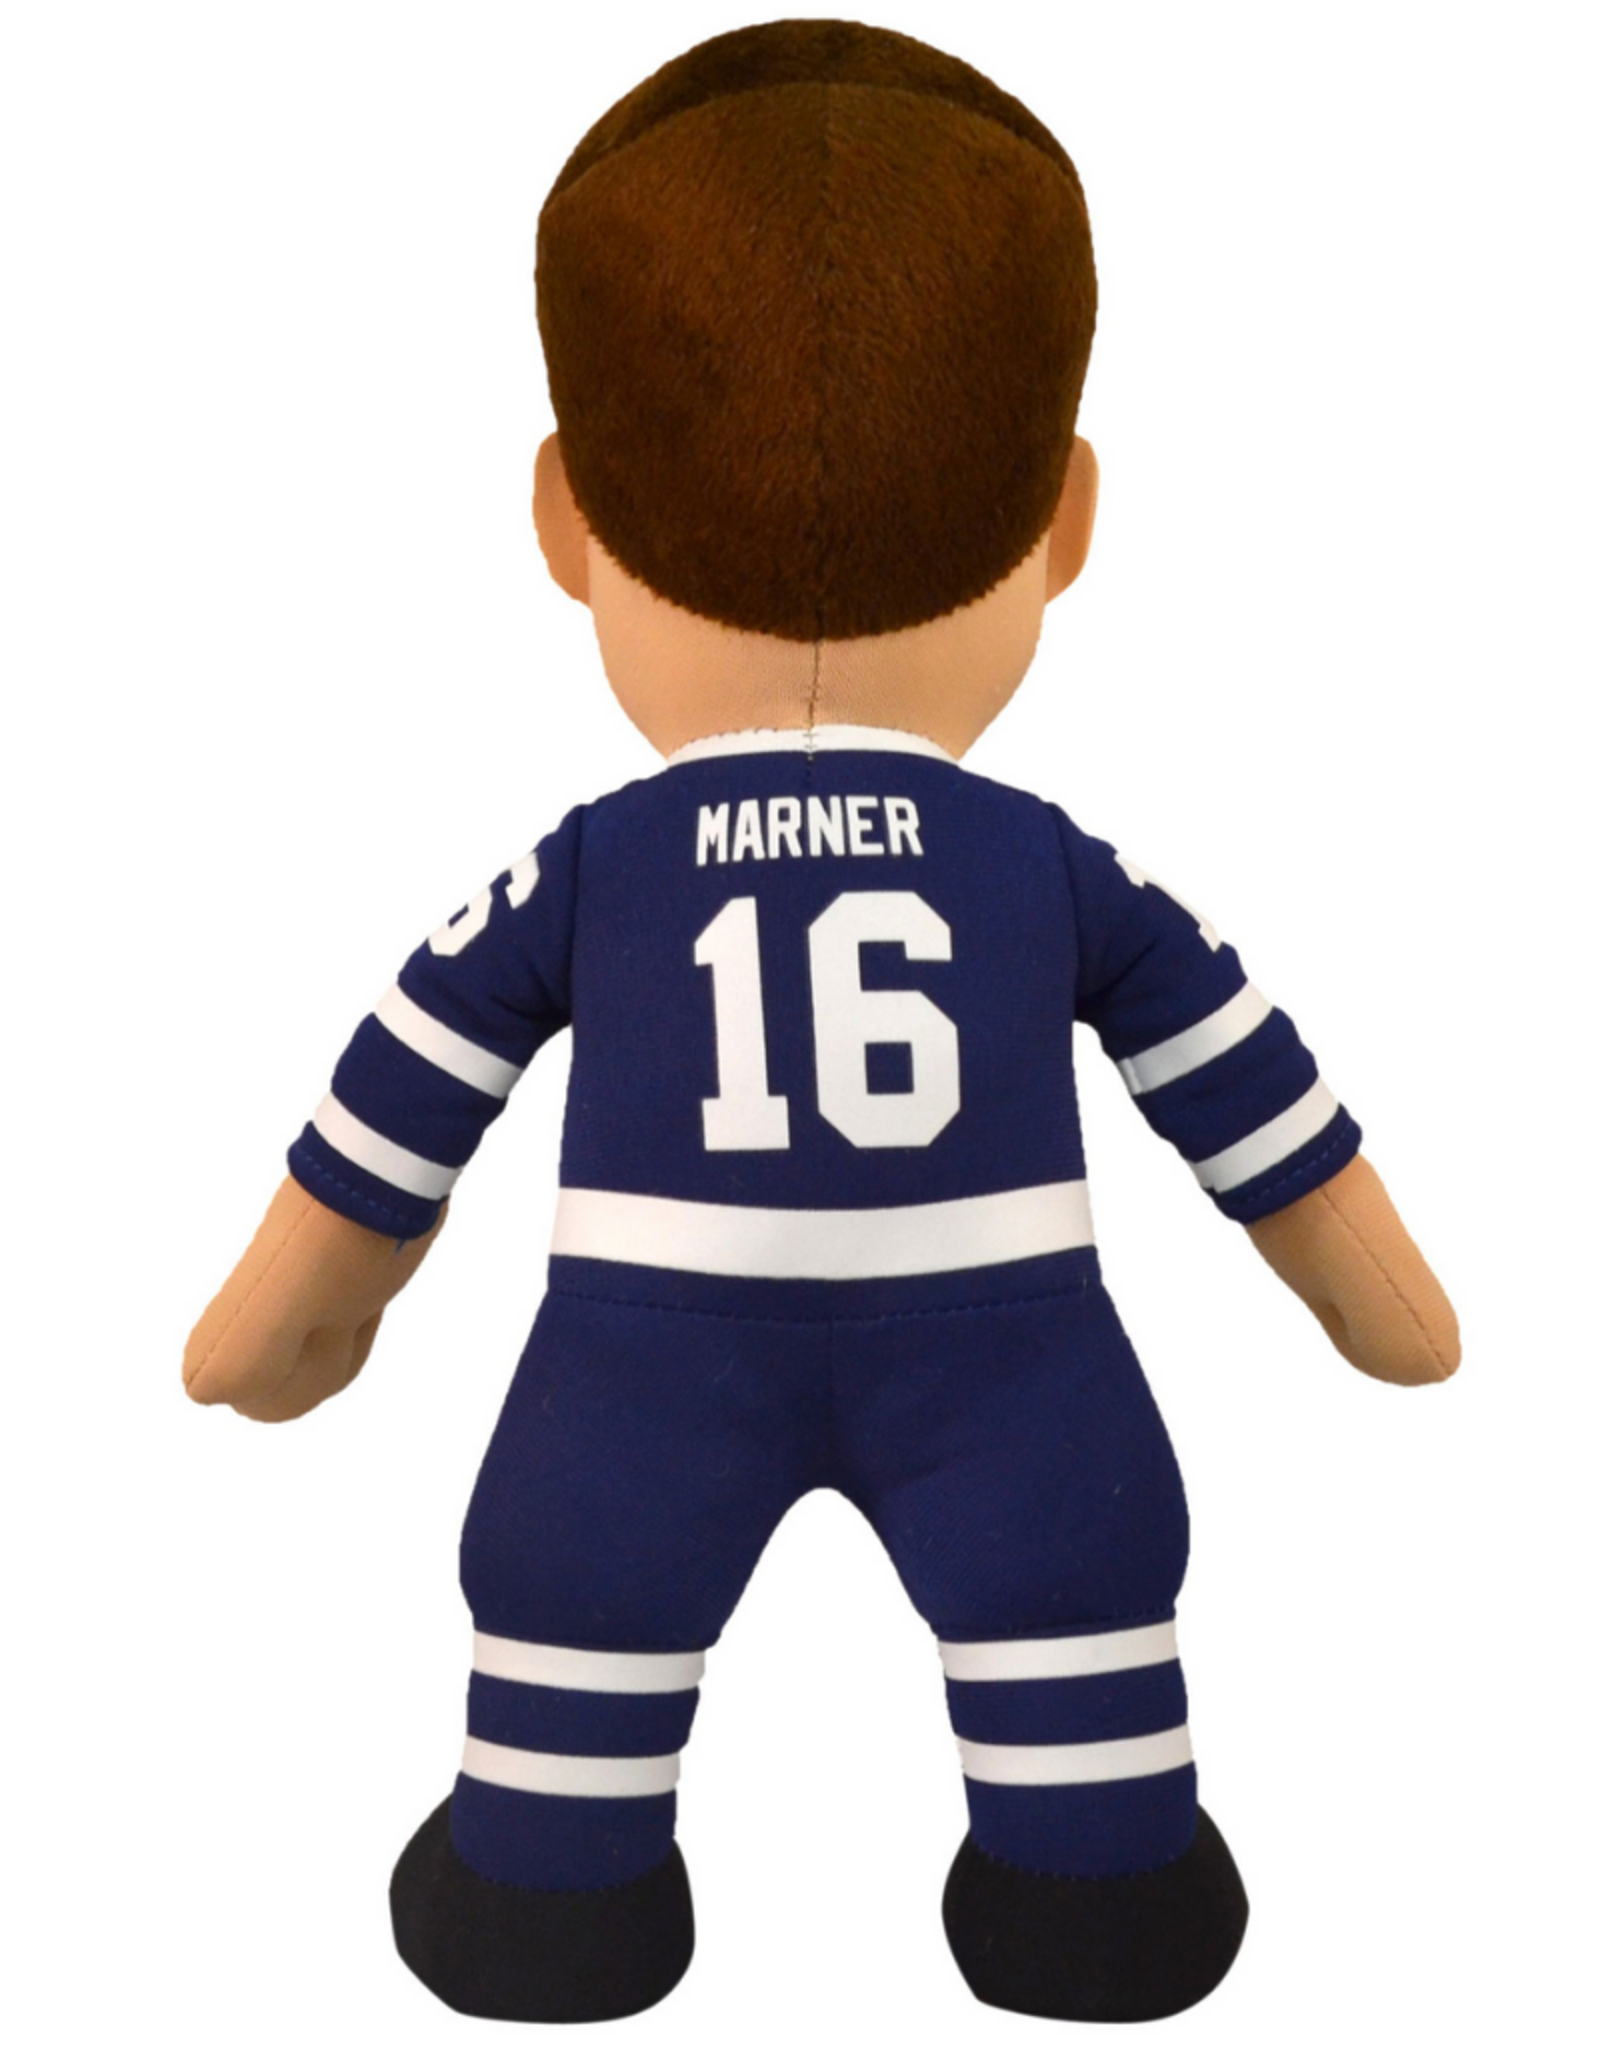 Bleacher Creature NHL Bleacher Creature Mitch Marner #16 Toronto Maple Leafs